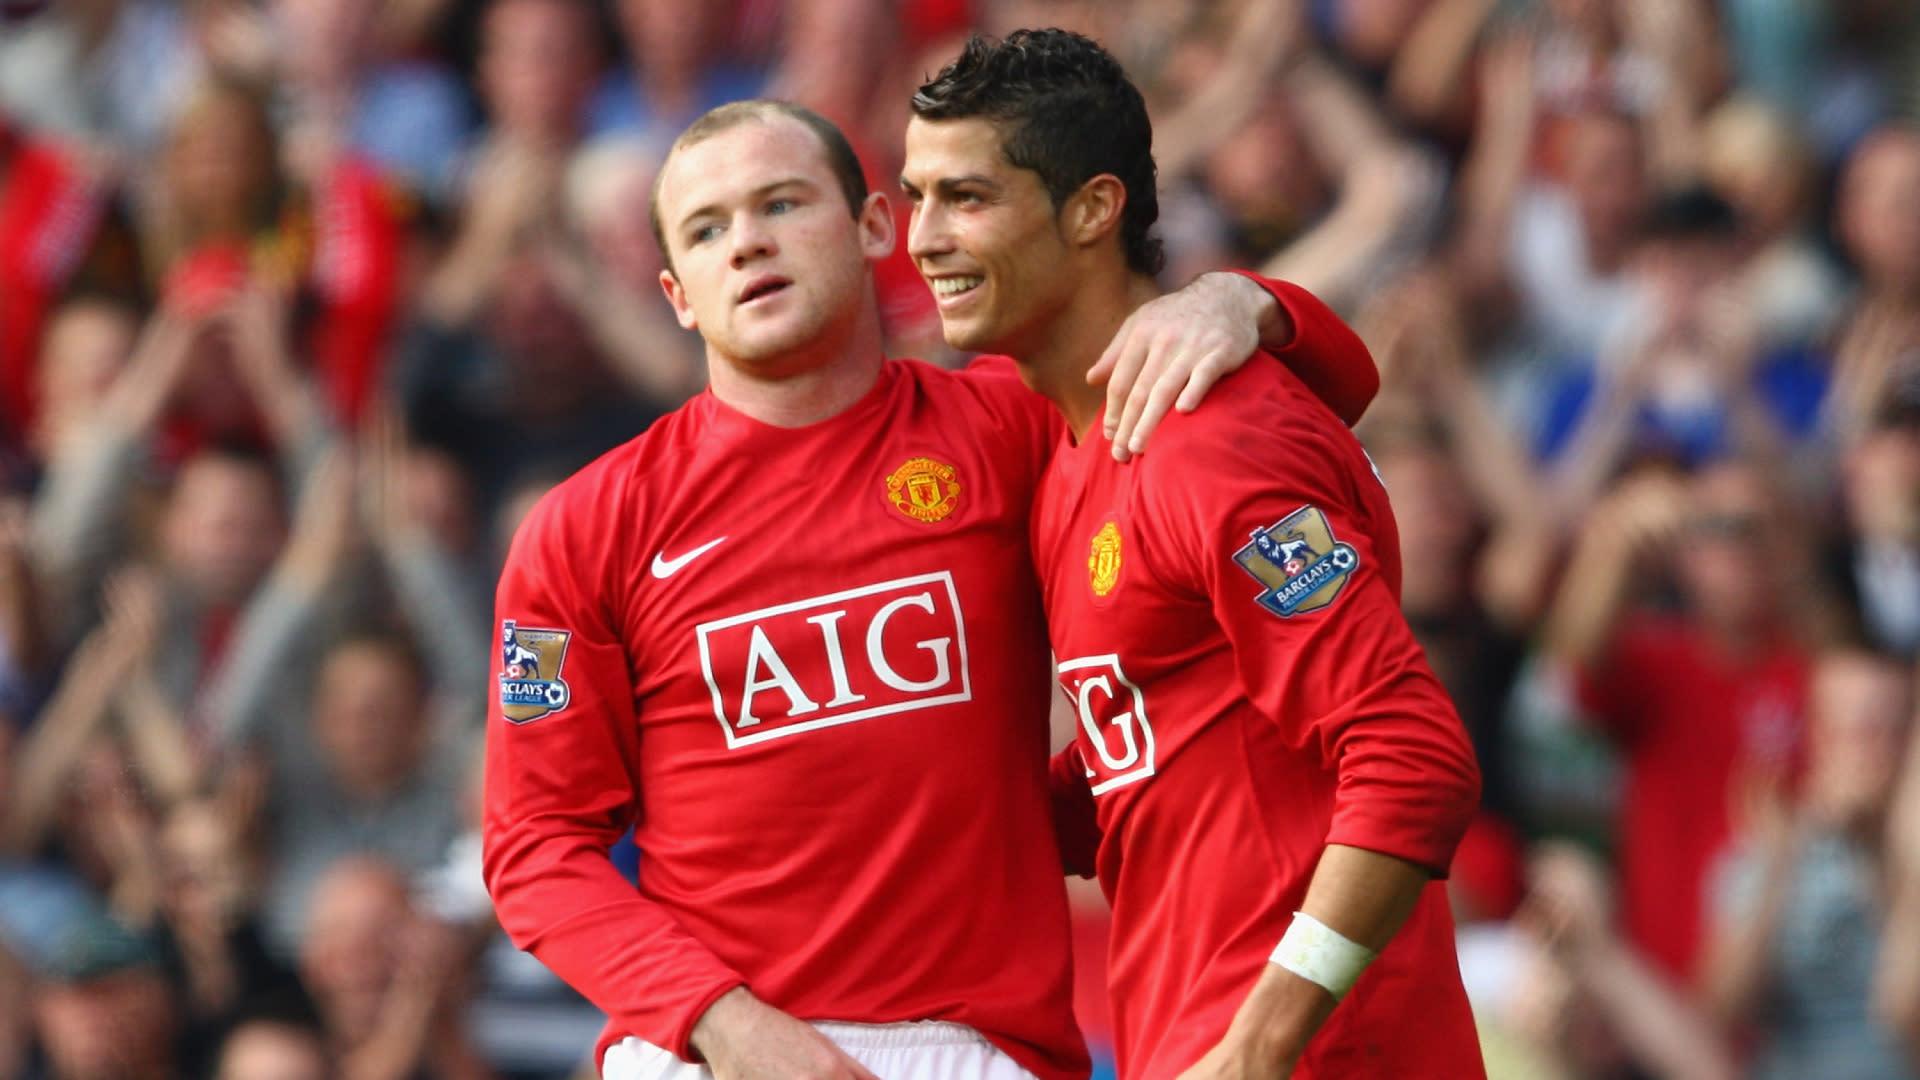 Rooney Reveals Taking Ronaldo To Mcdonalds Before Man Utd Match